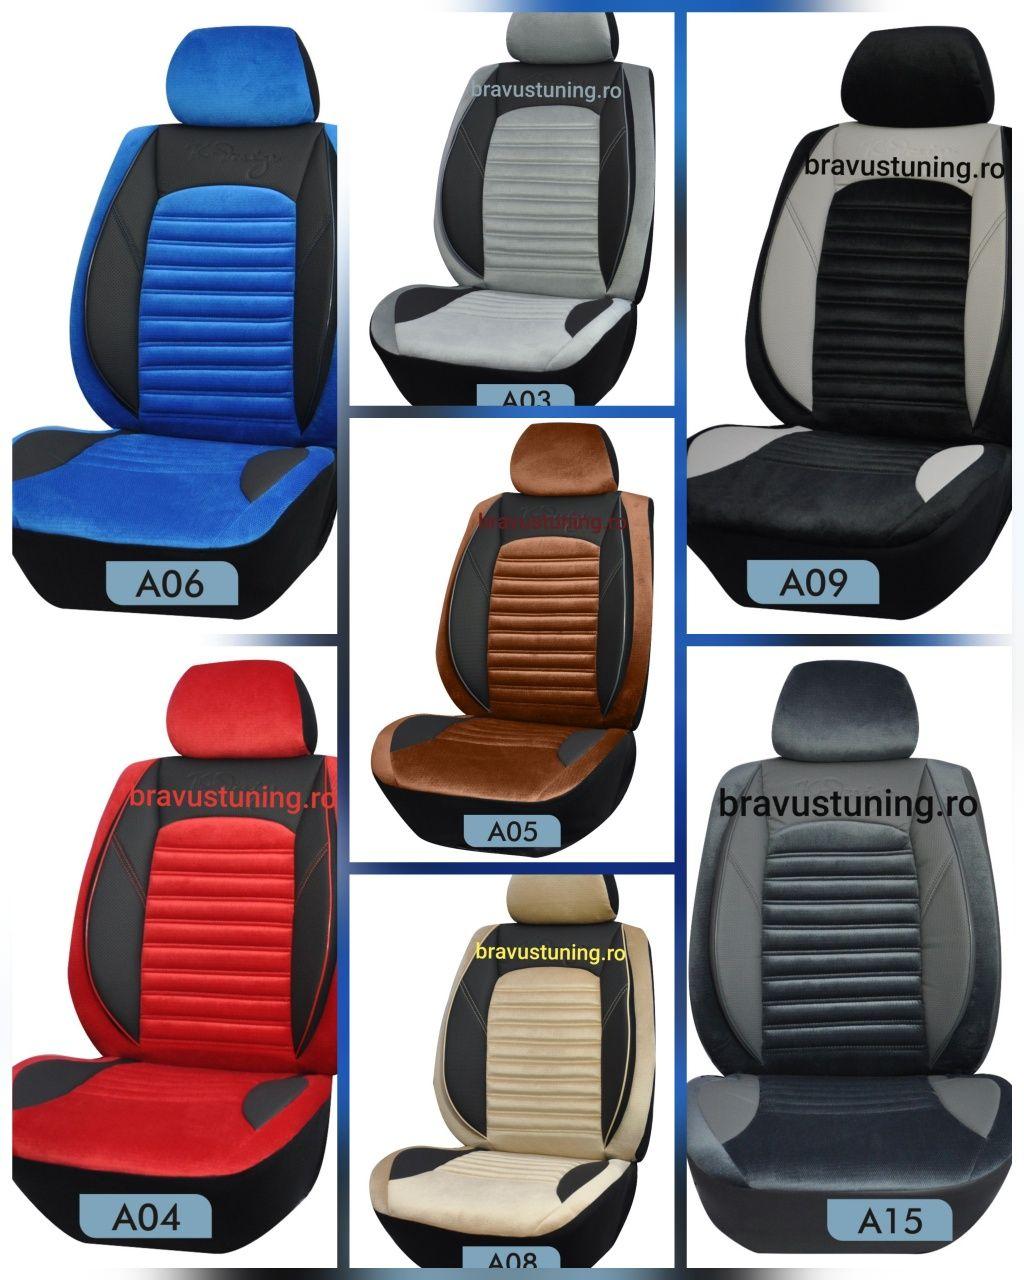 Huse scaun auto VELUR SET COMPLET Audi,Passat,Skoda,Logan,Vw,BMW etc